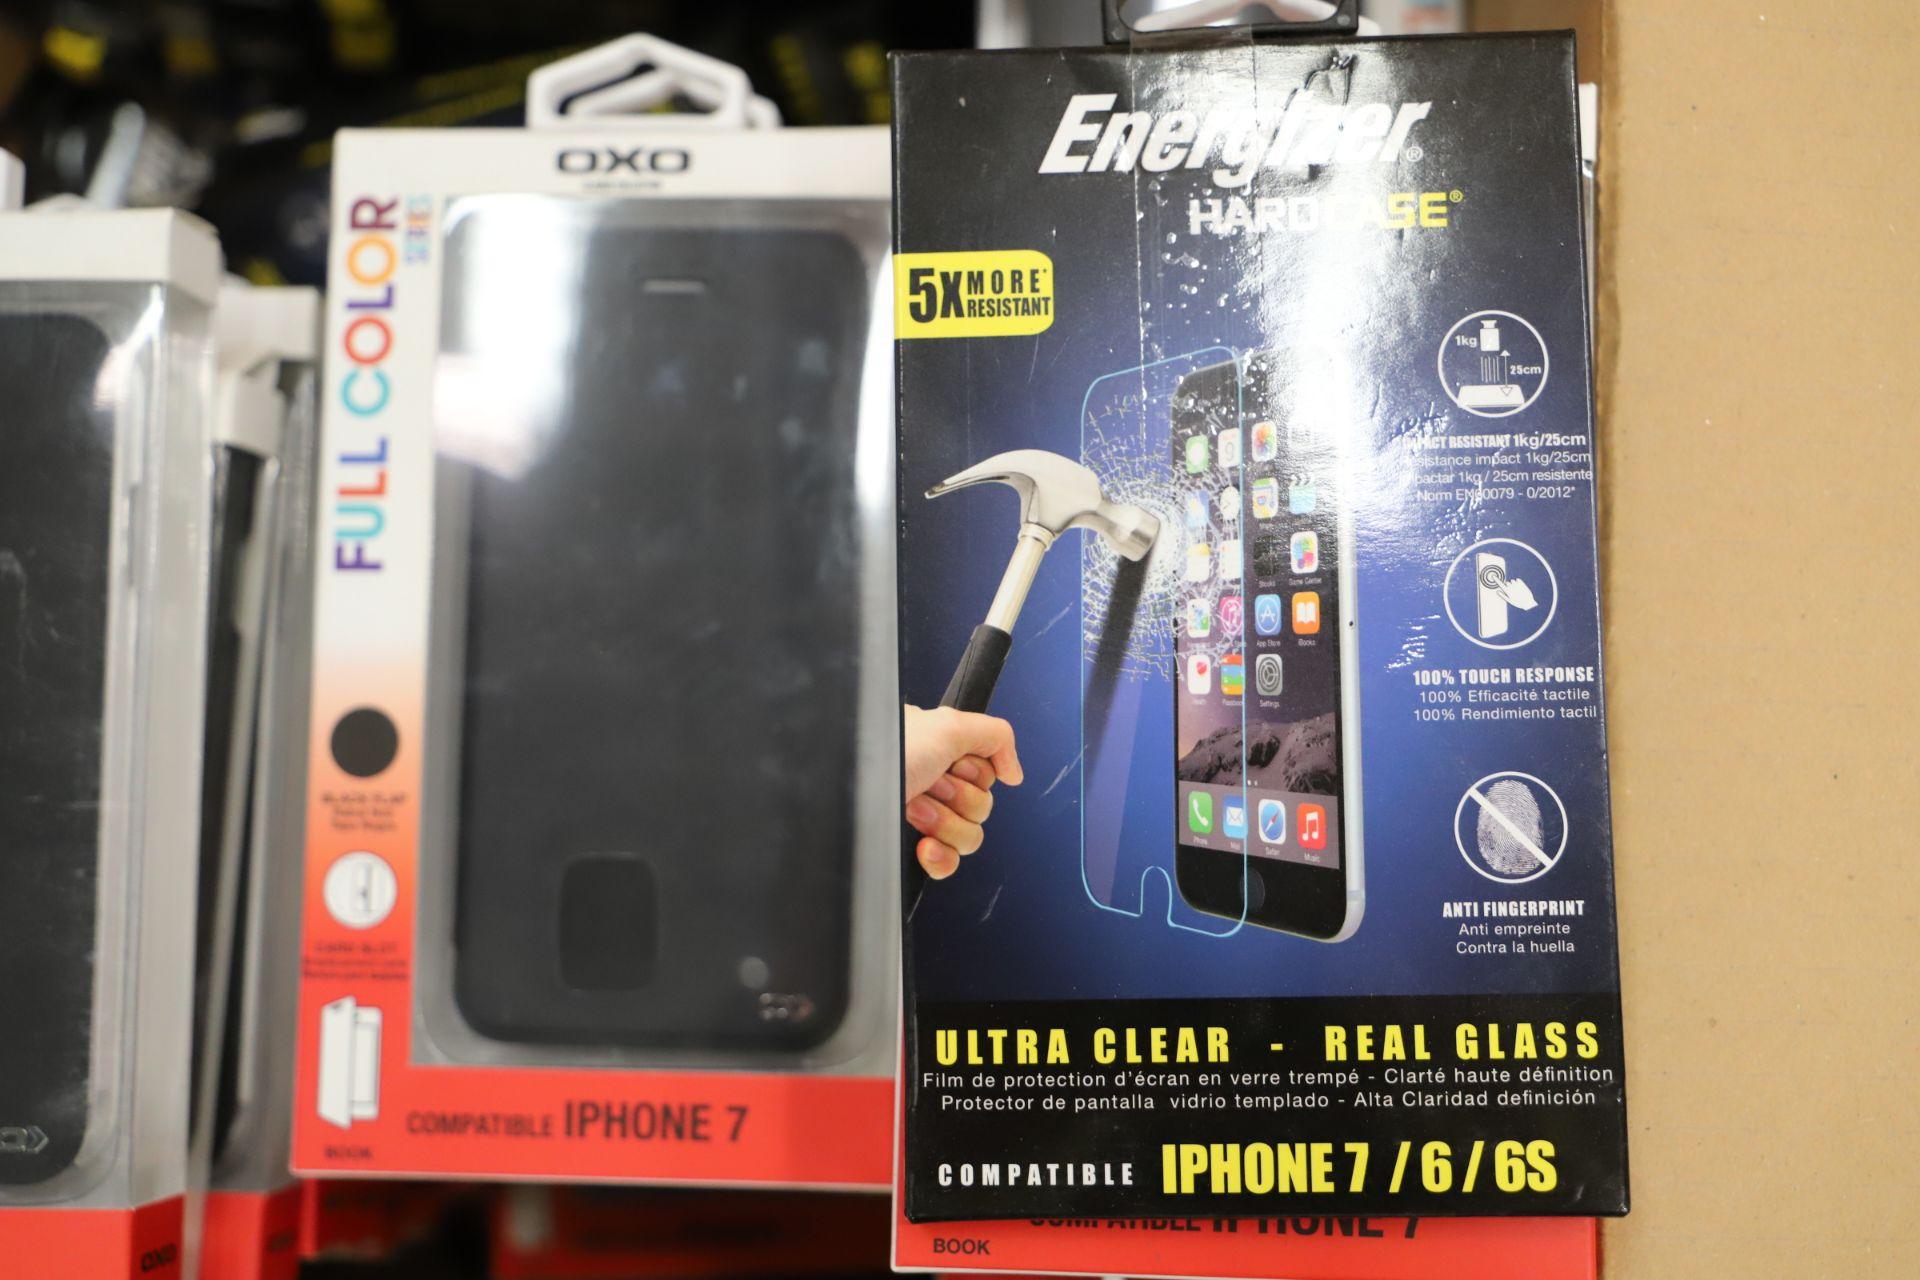 Lot 11 - *No Reserve* Mixed Lot 84 items - Iphone Accessories. RRP £1343.16